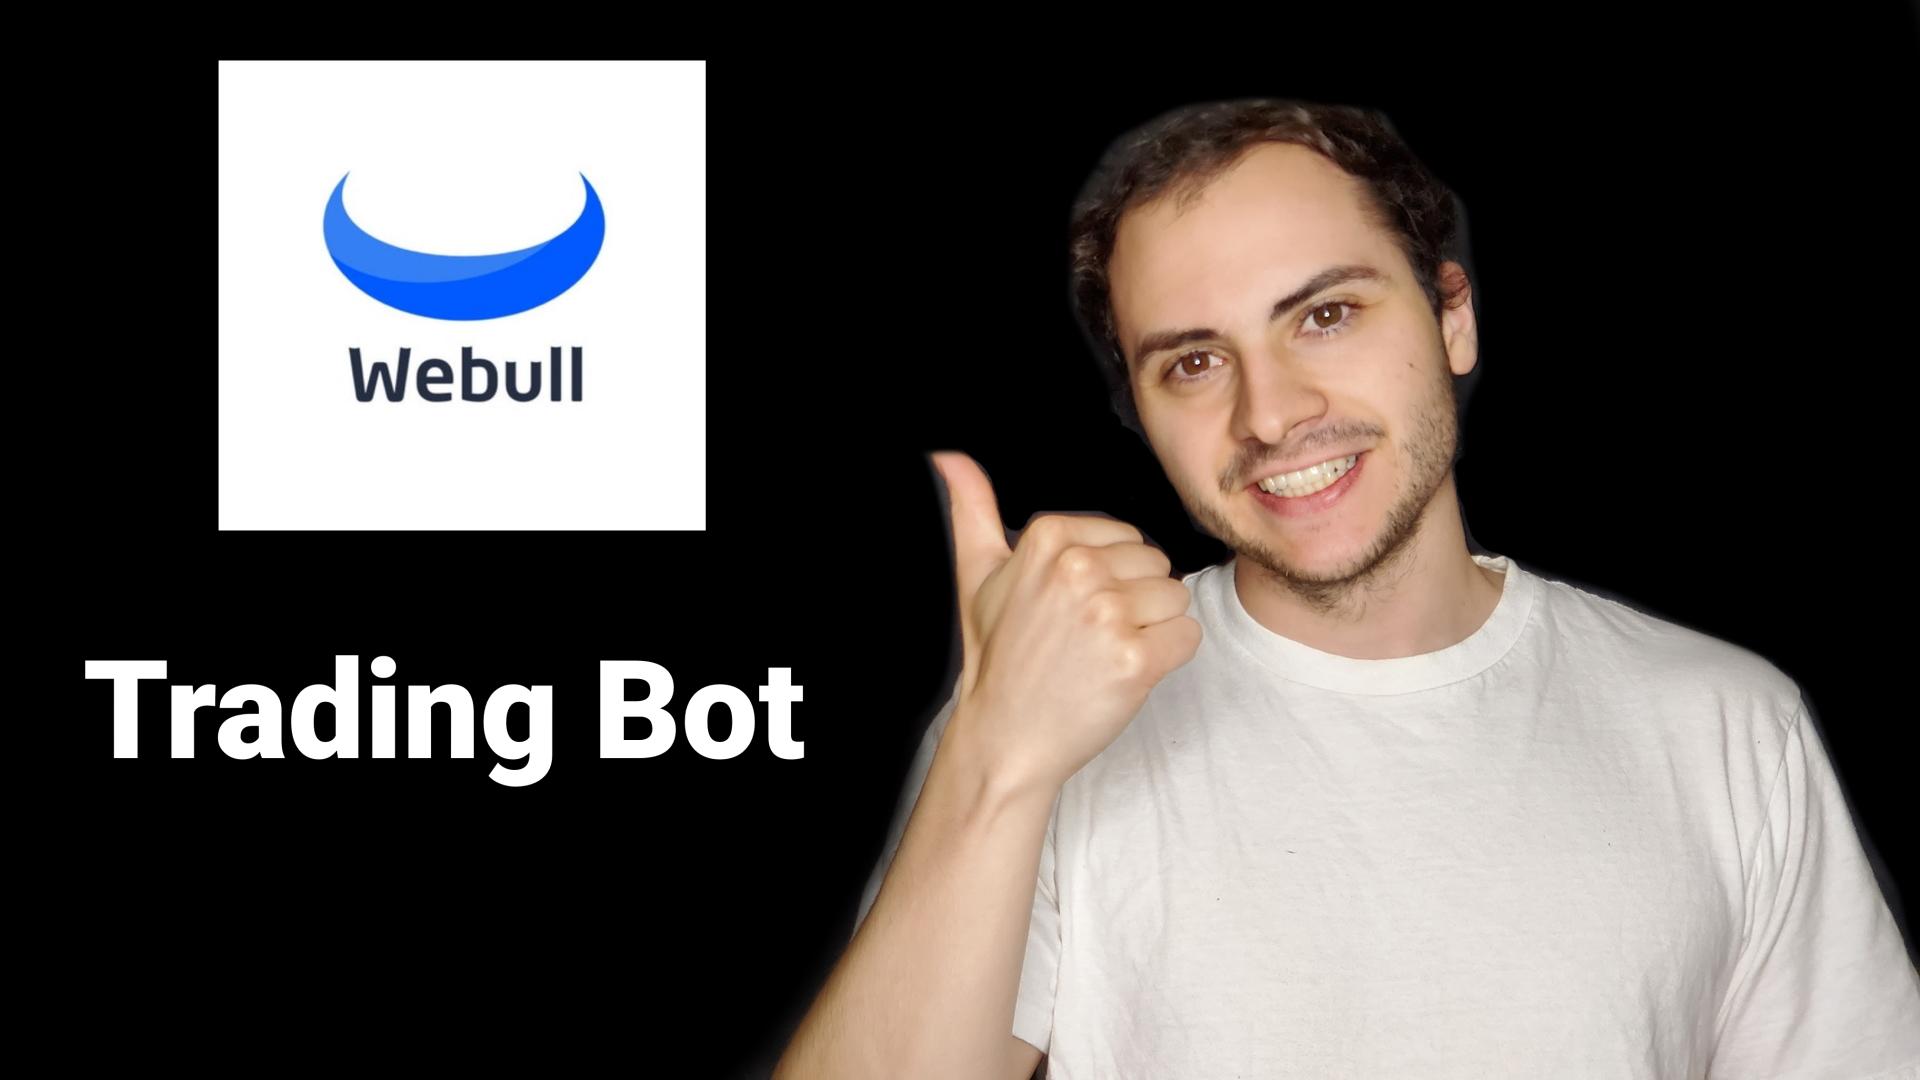 Futures trading bot